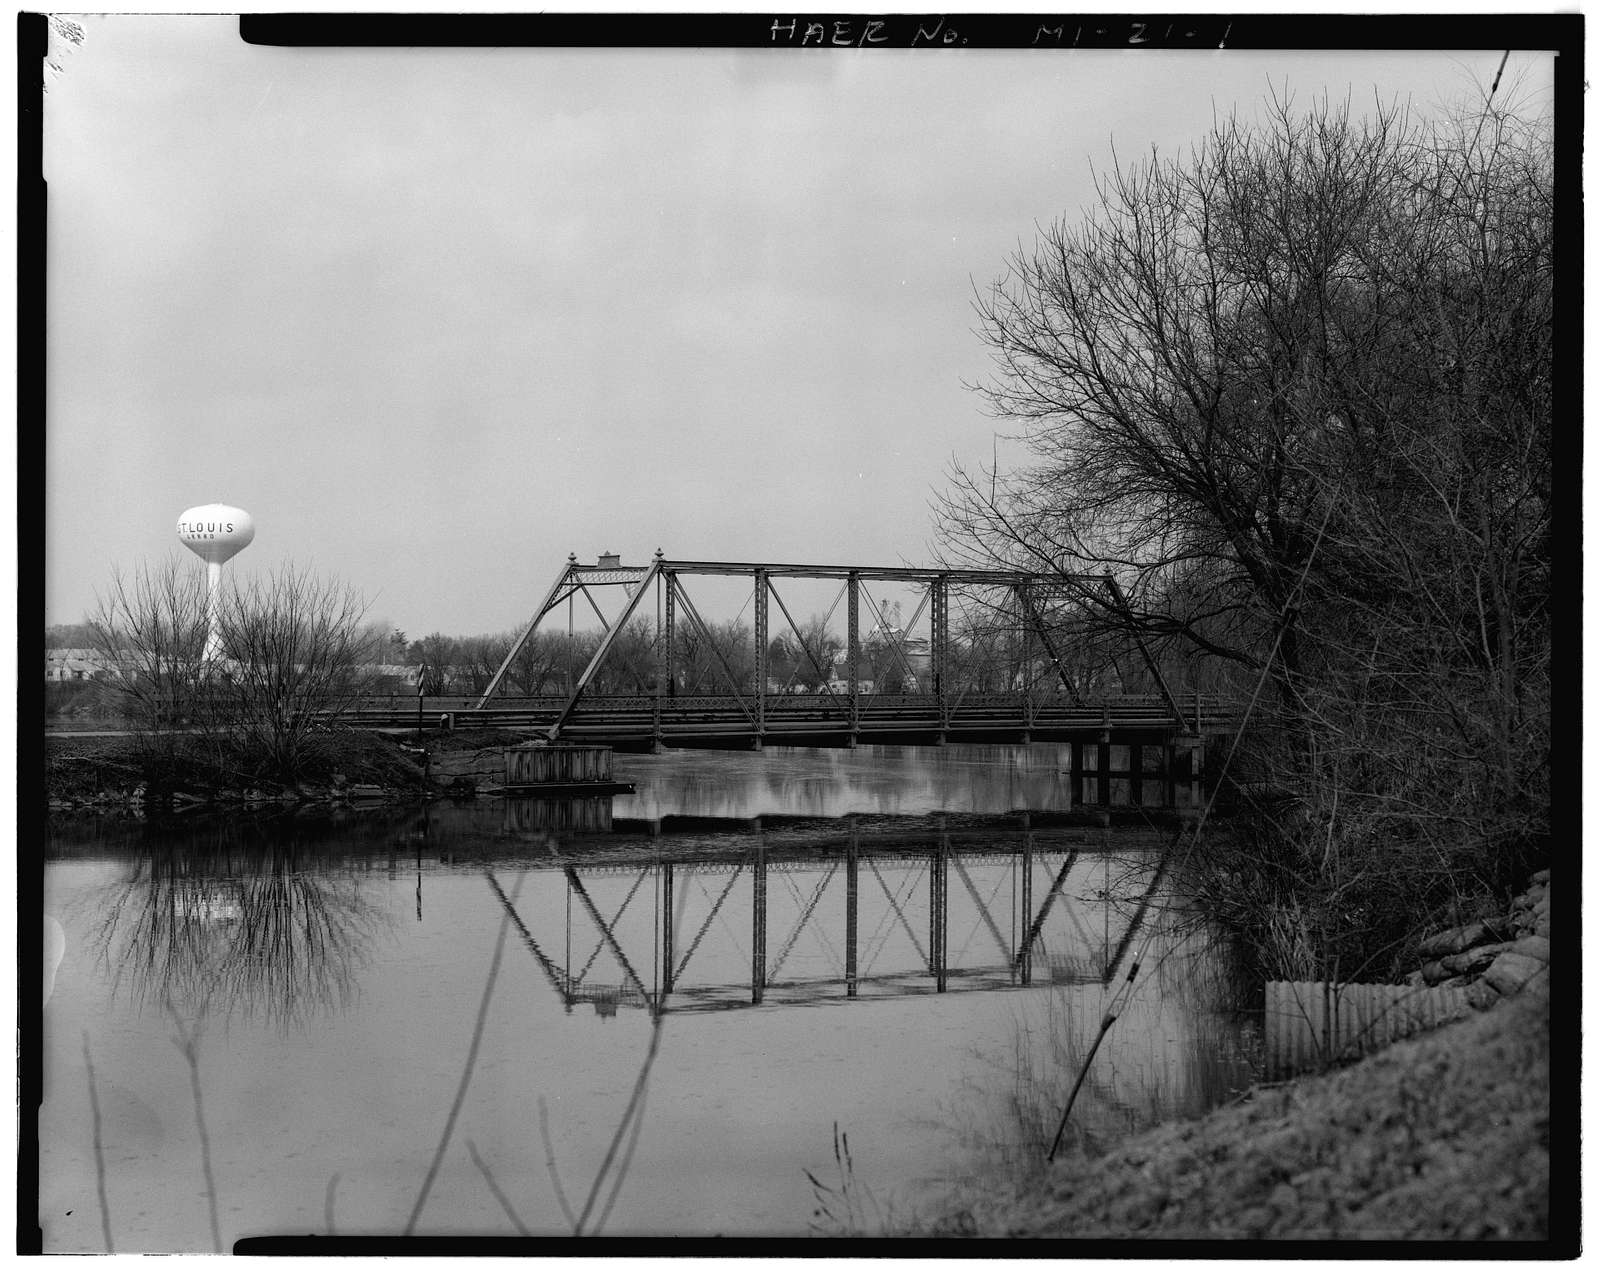 Cheesman Road Bridge, Spanning Pine Bridge, Saint Louis, Gratiot County, MI